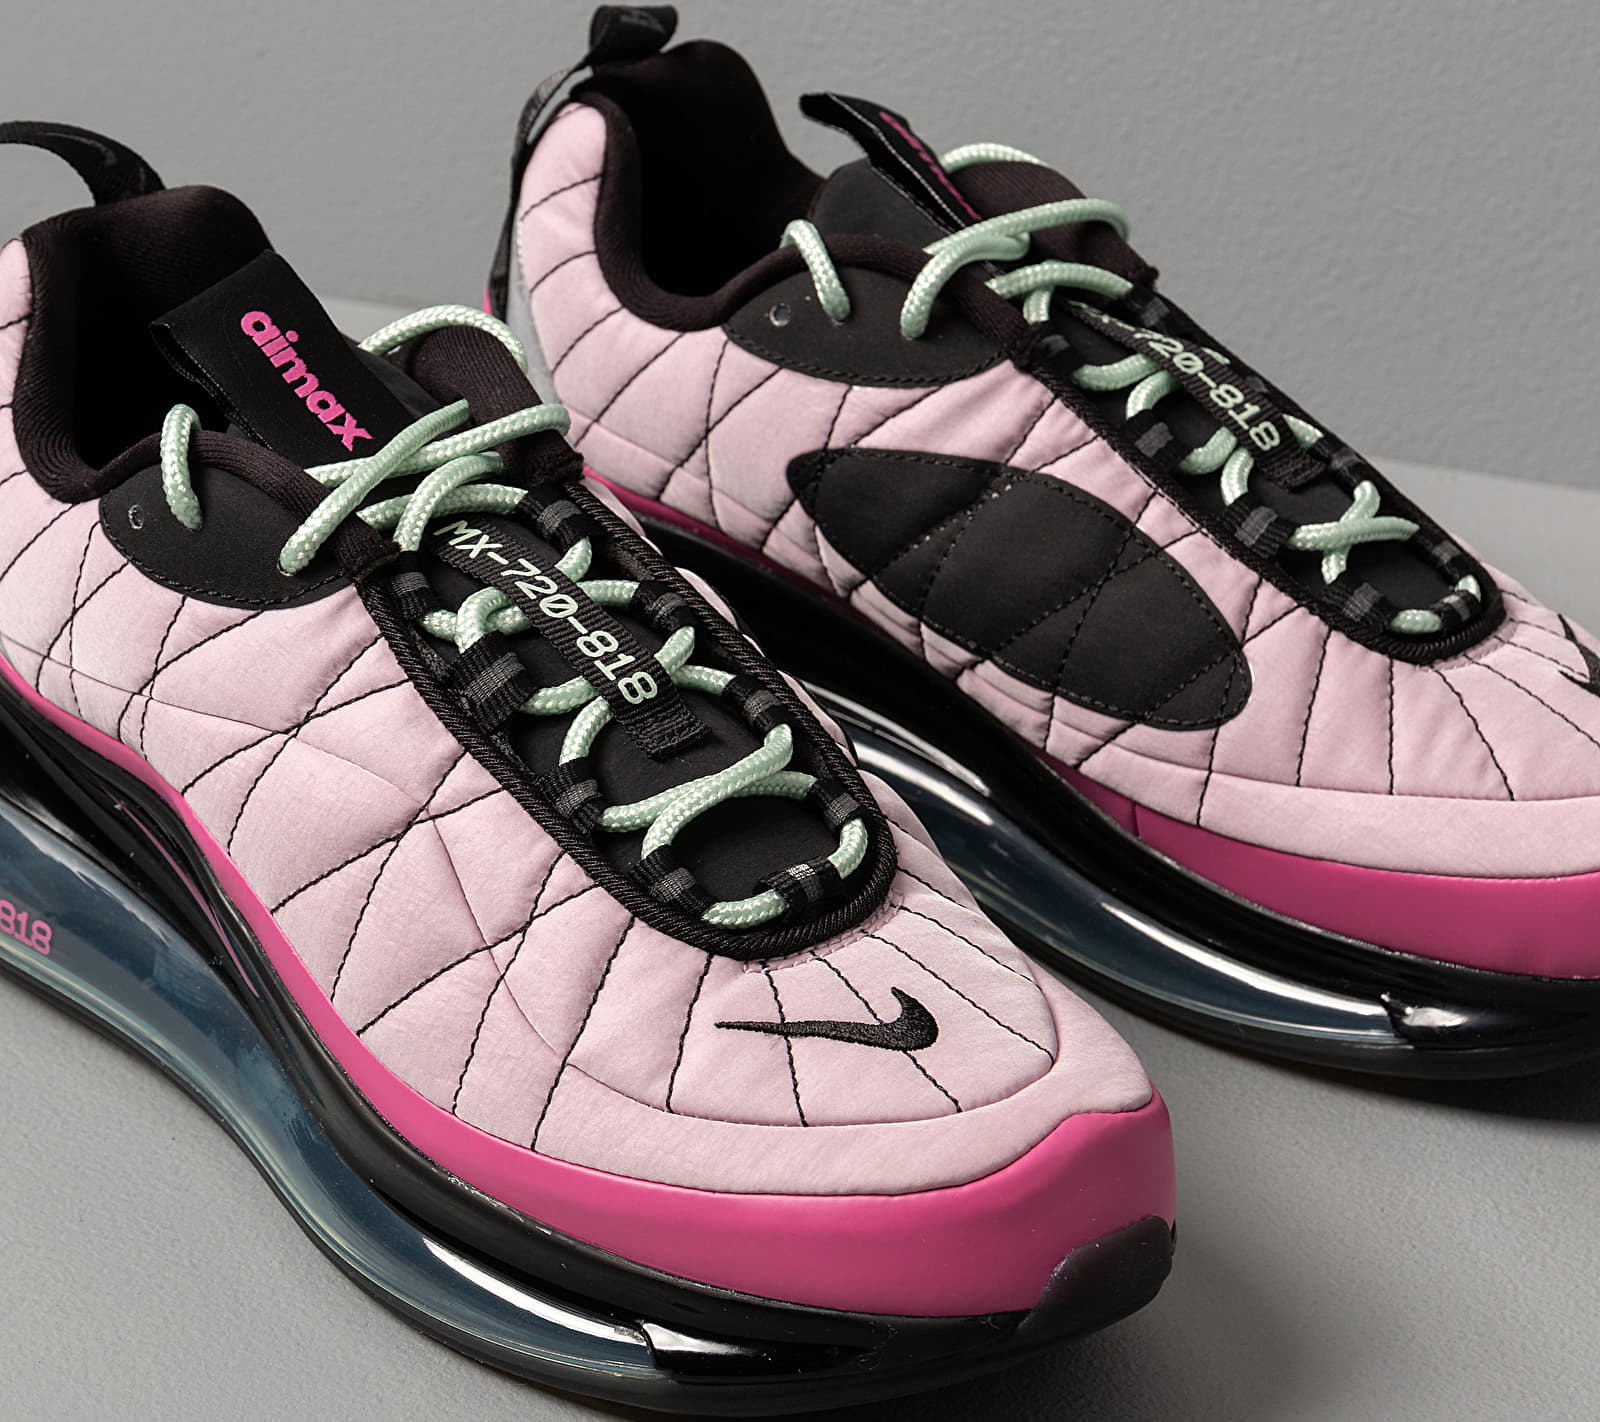 Nike W Mx-720-818 Iced Lilac/ Cosmic Fuchsia-Black, Purple